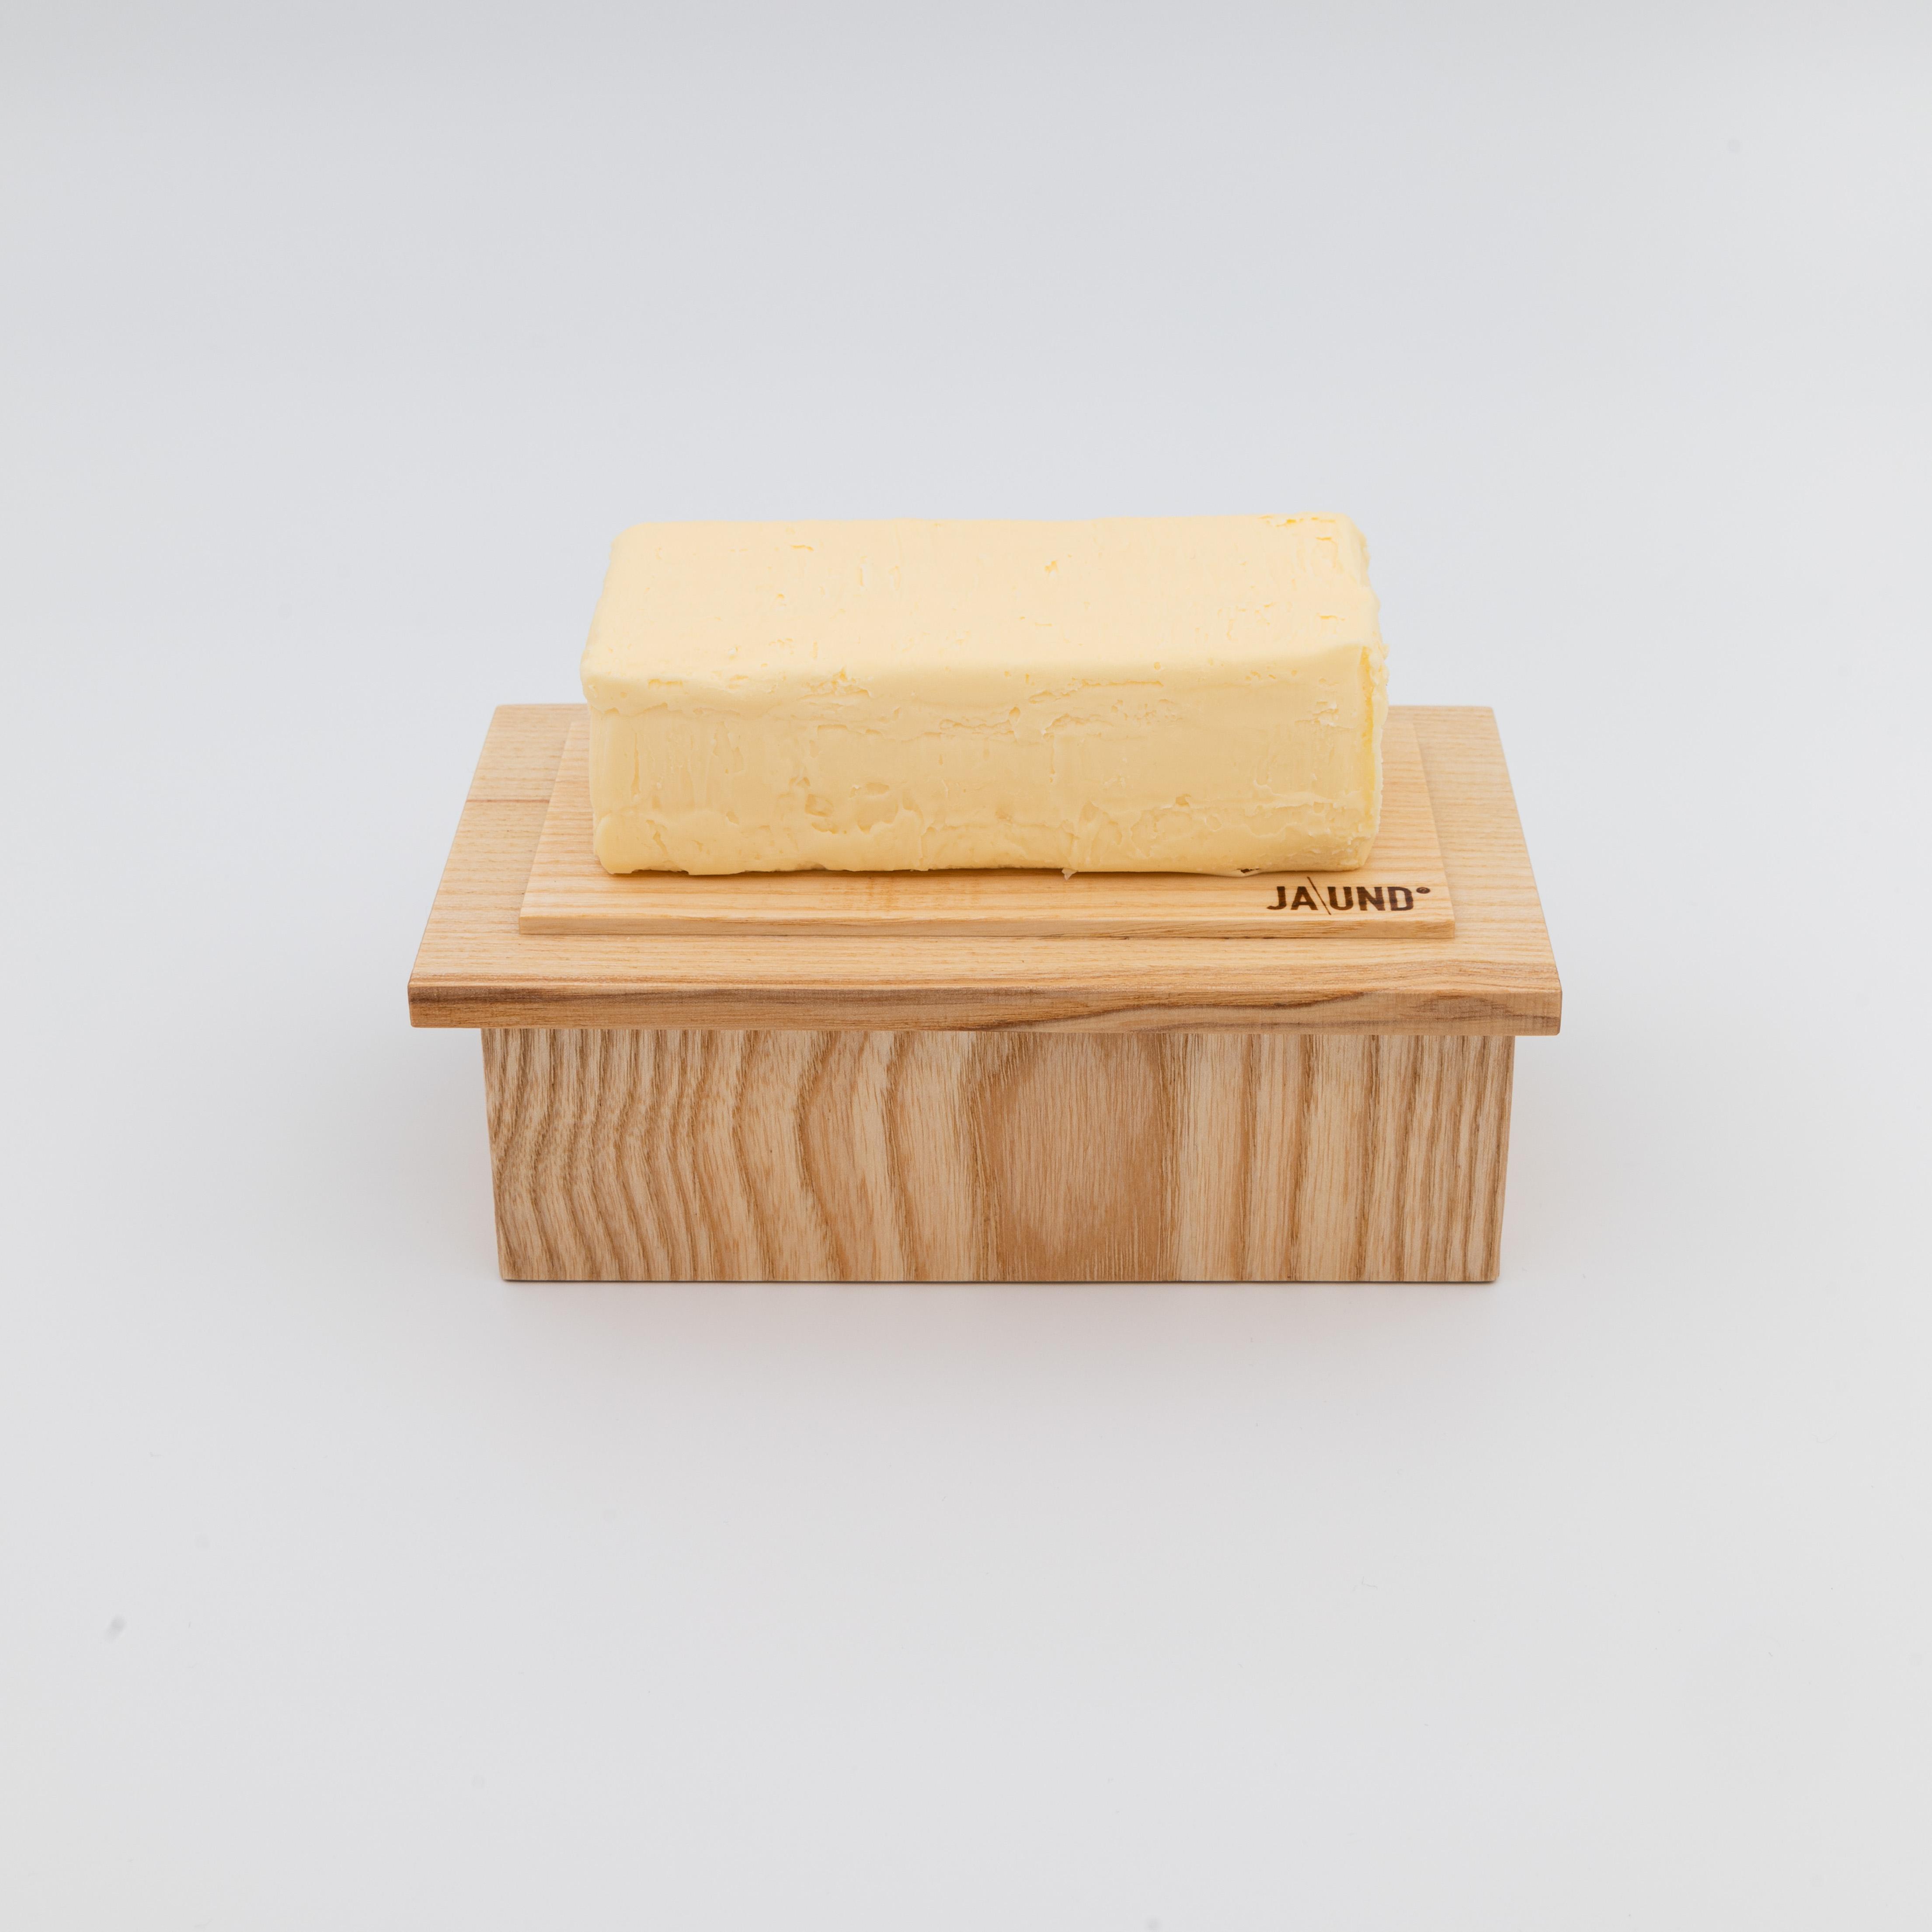 Butterbox aus hellem Holz mit Butter drauf.